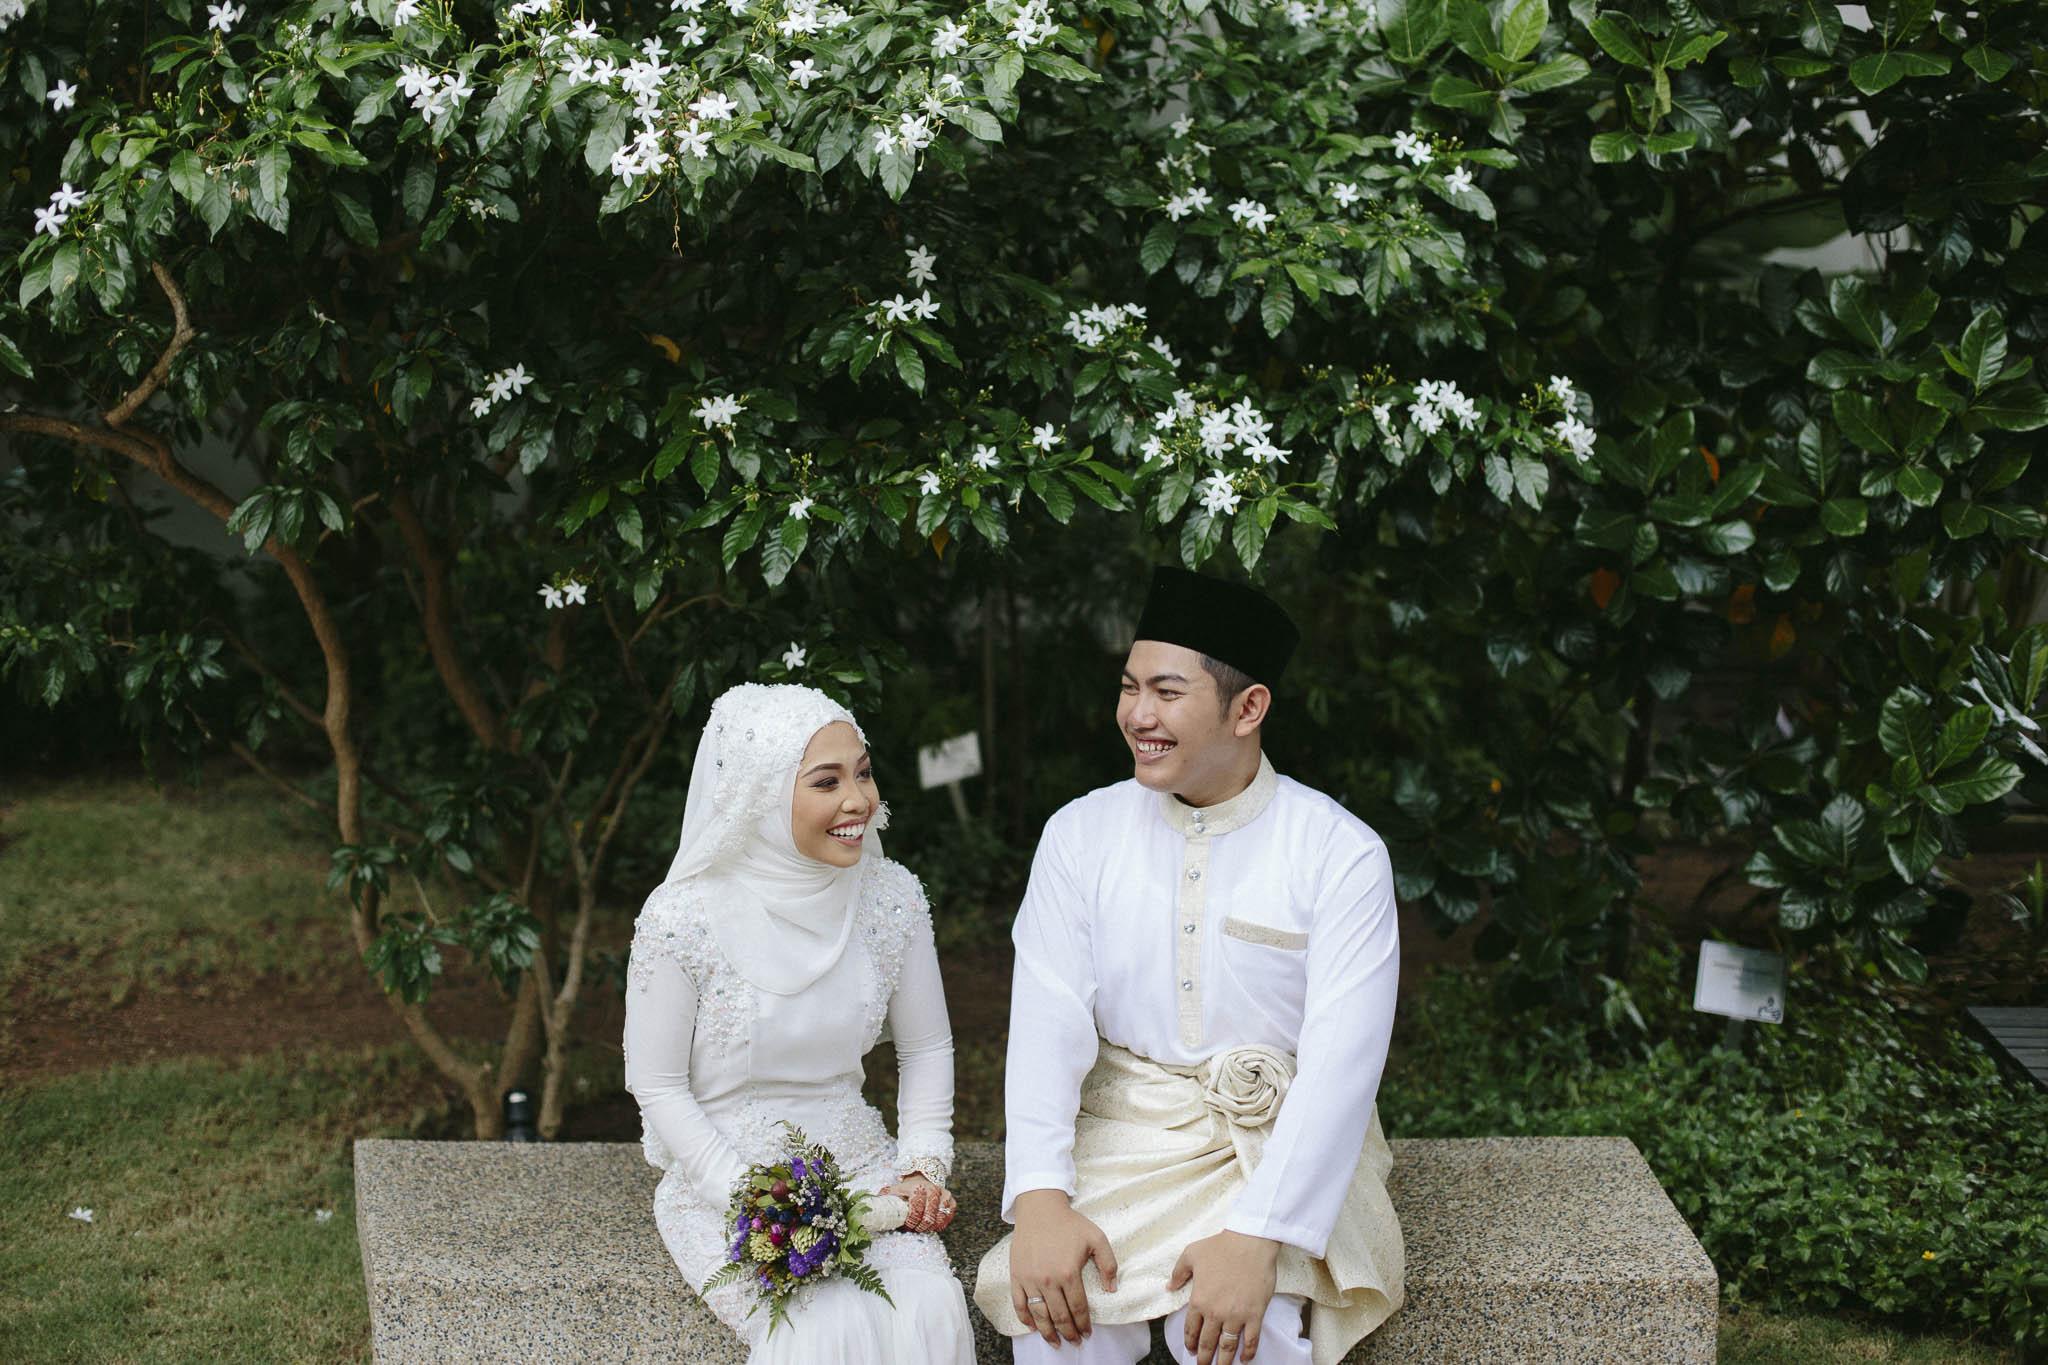 singapore-wedding-photographer-malay-indian-pre-wedding-travel-wmt-2015-53.jpg